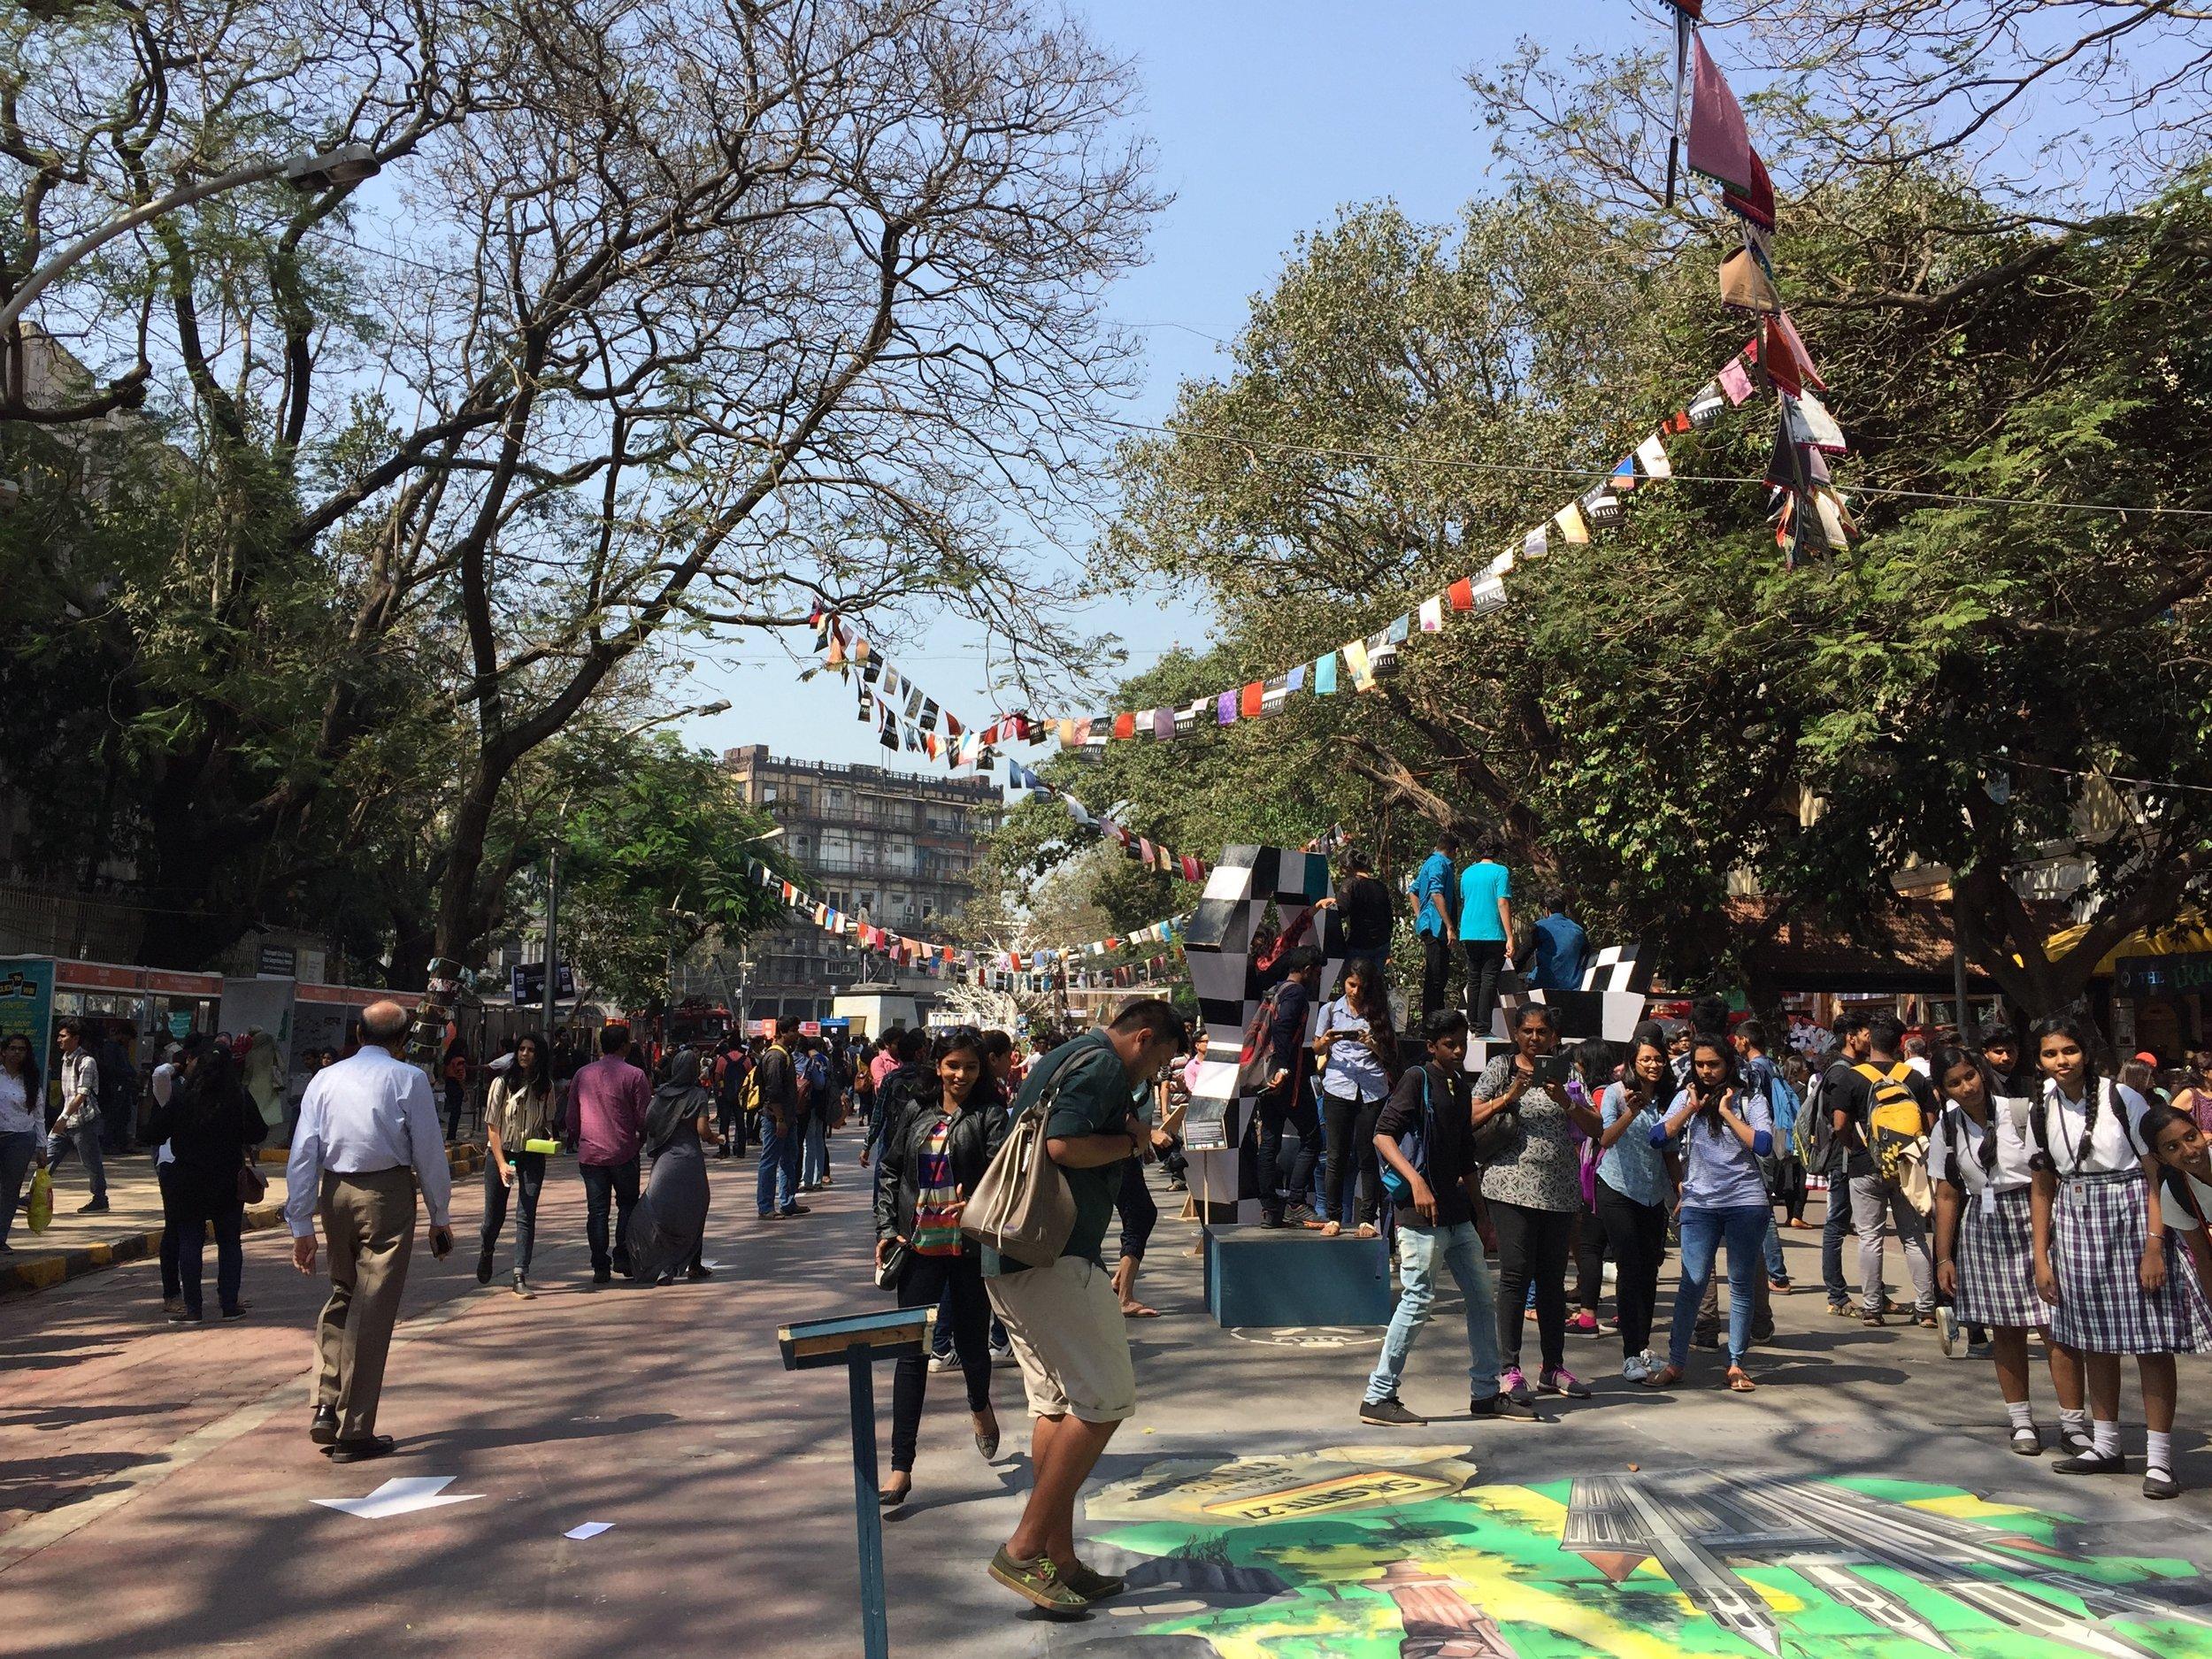 We spent some time exploring the Kala Ghoda art festival